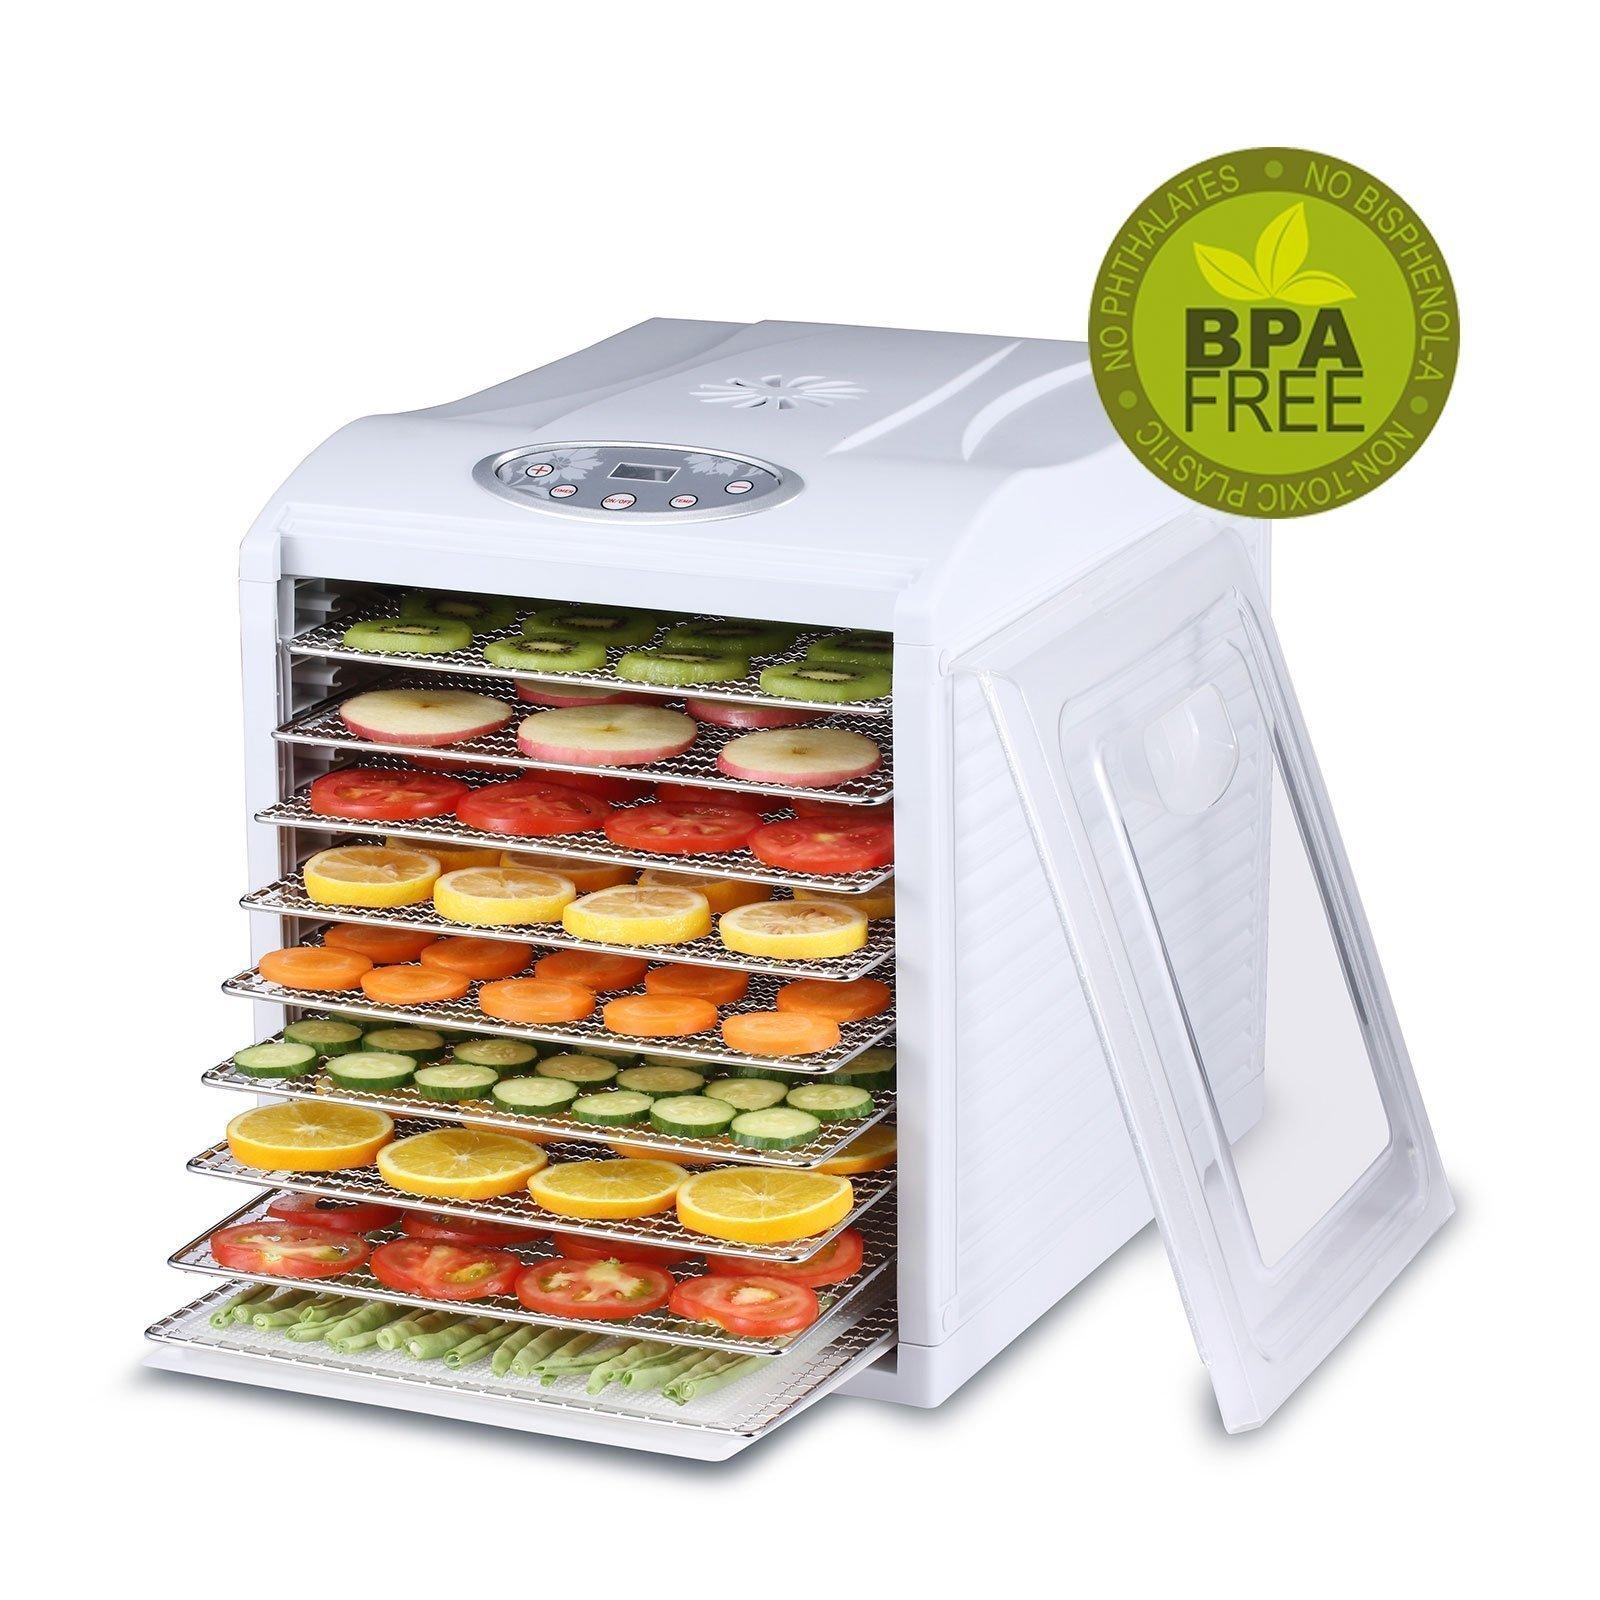 BioChef Arizona Sol Food Dehydrator 9 x BPA FREE Stainless Steel Drying Trays & Digital Timer - Includes: 3 x Non Stick & 3 x Fine Mesh Sheet & Drip Tray. Best Drier for Raw Food, Fruit, Jerky (White)